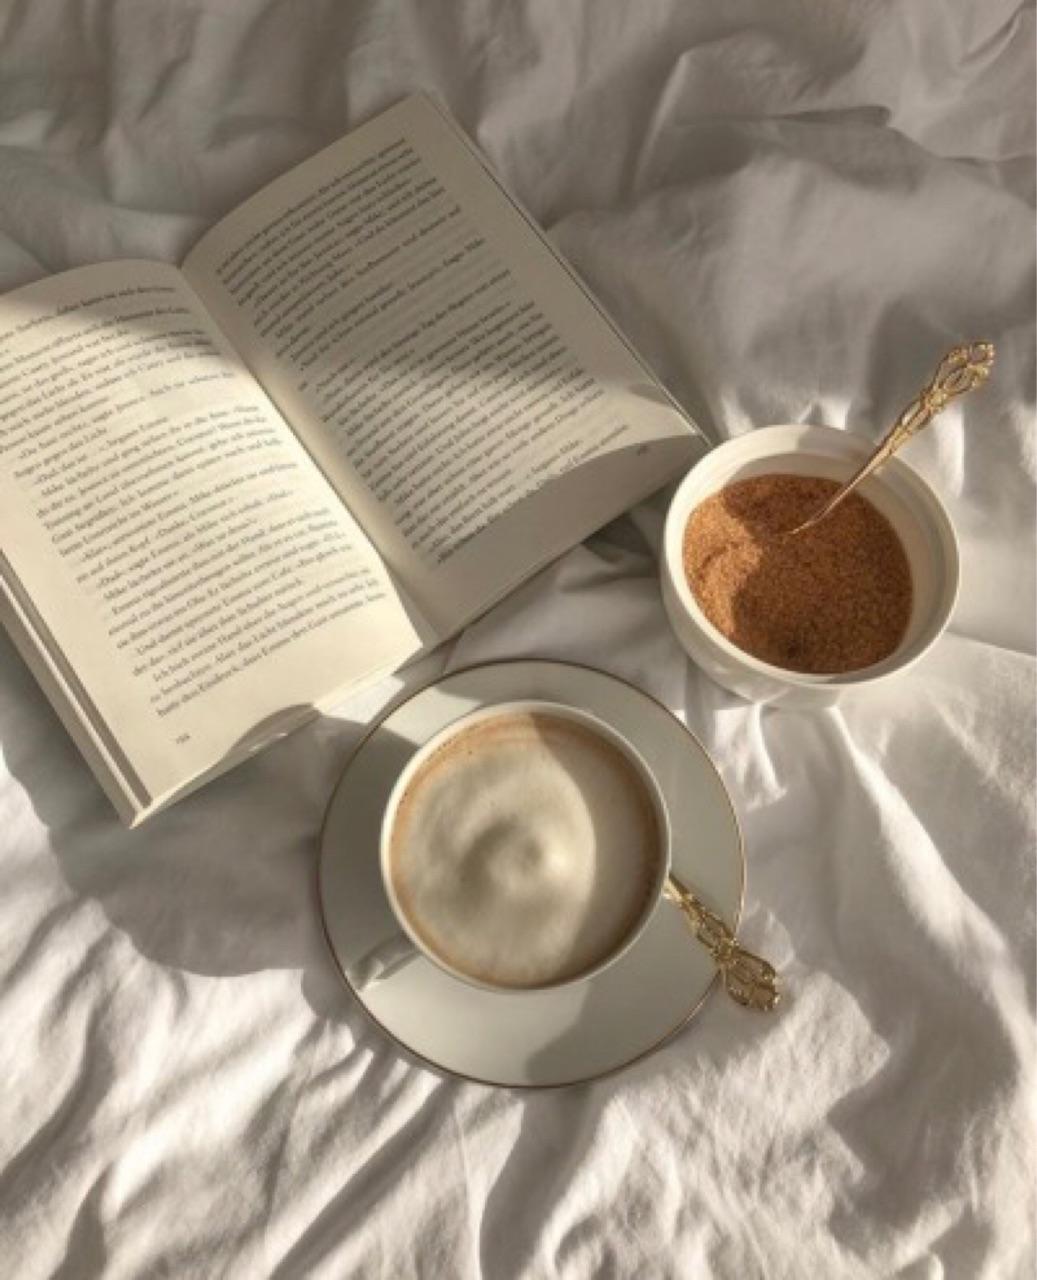 bella swan, book, and literature image